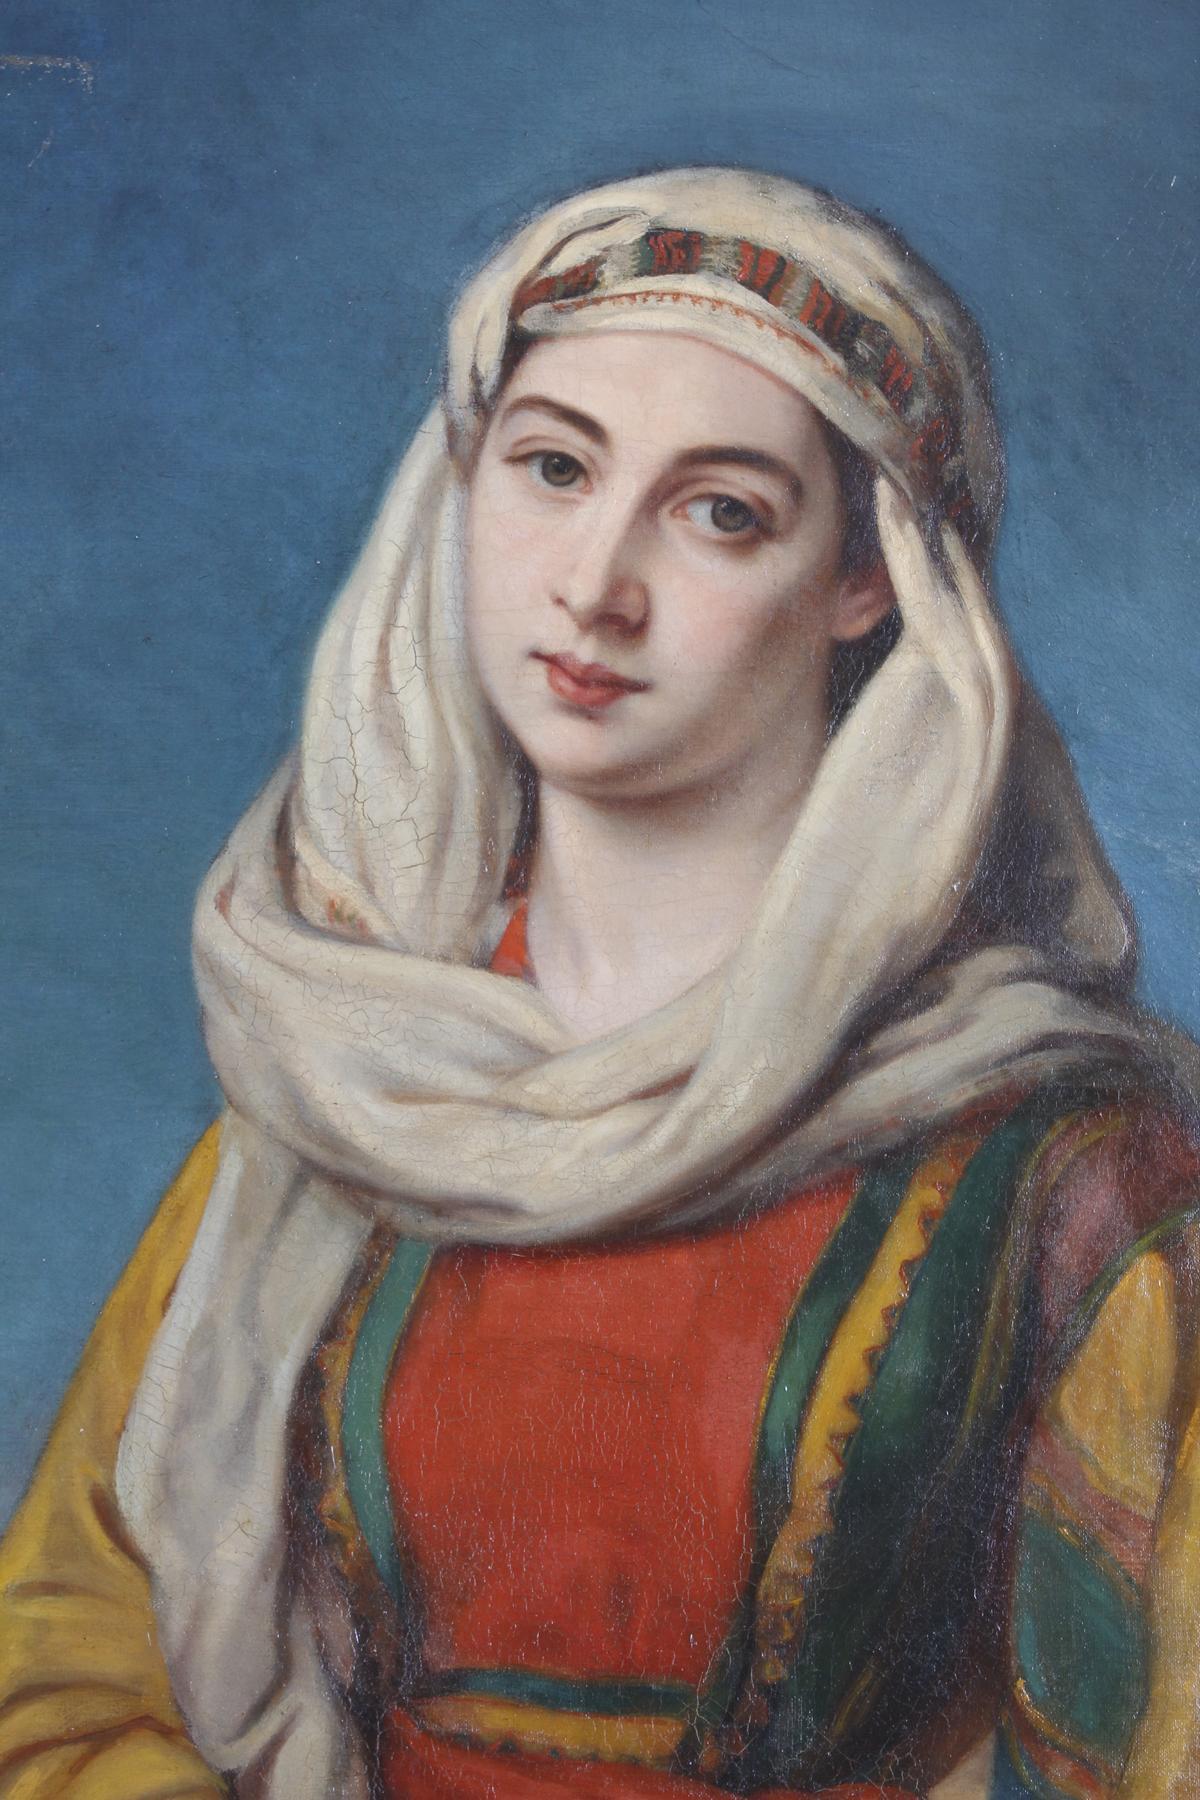 Anonymer Maler aus dem 19. Jahrhundert-4